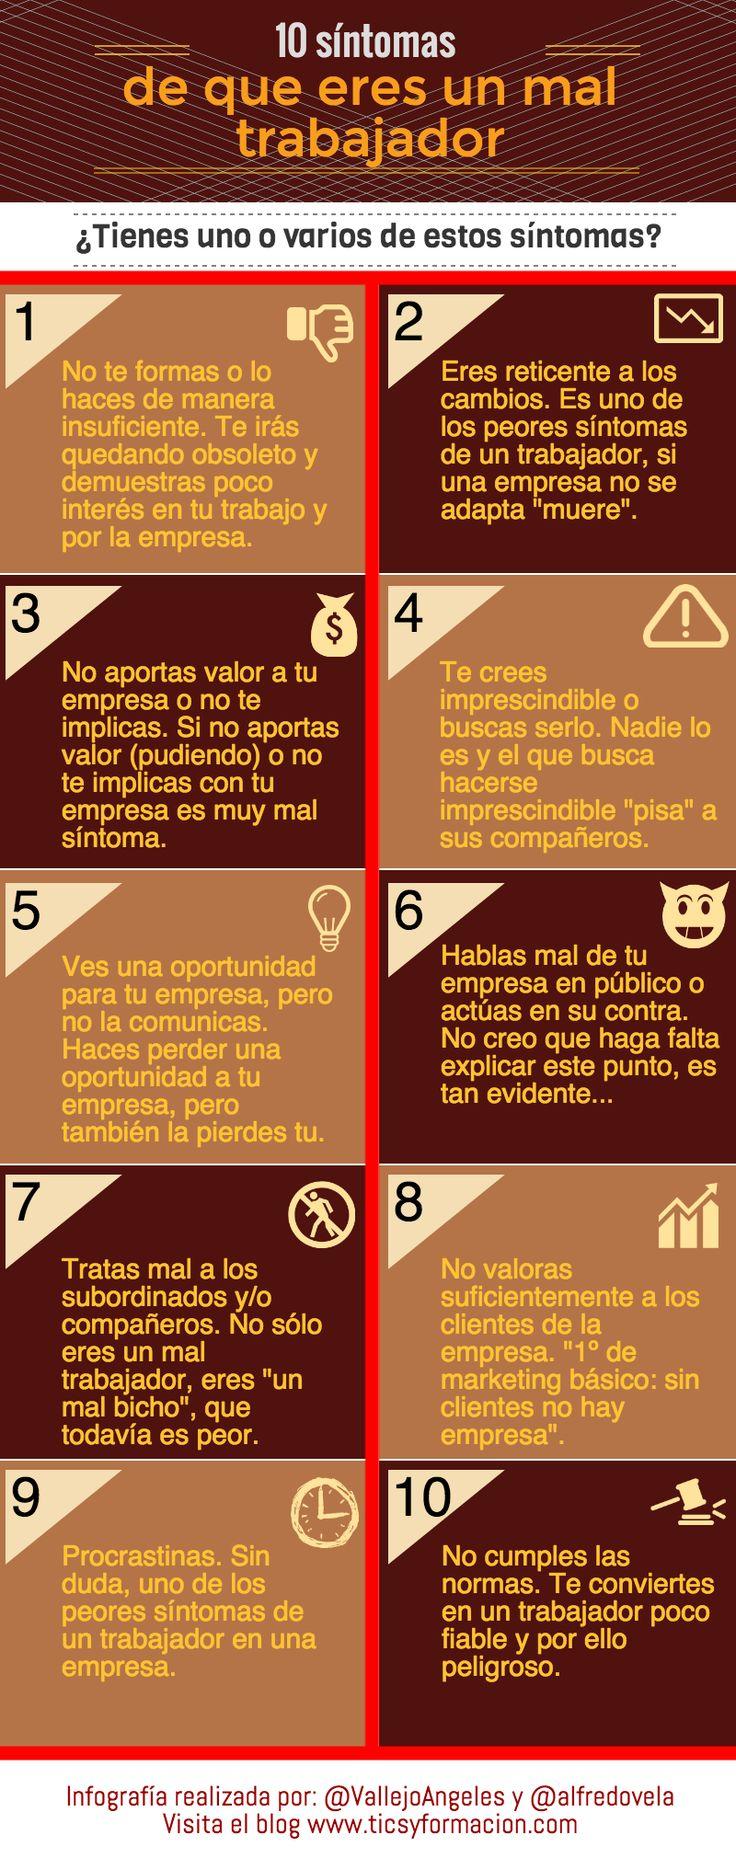 10 síntomas de que eres un mal trabajador #infografia #infographic #rrhh #empleo